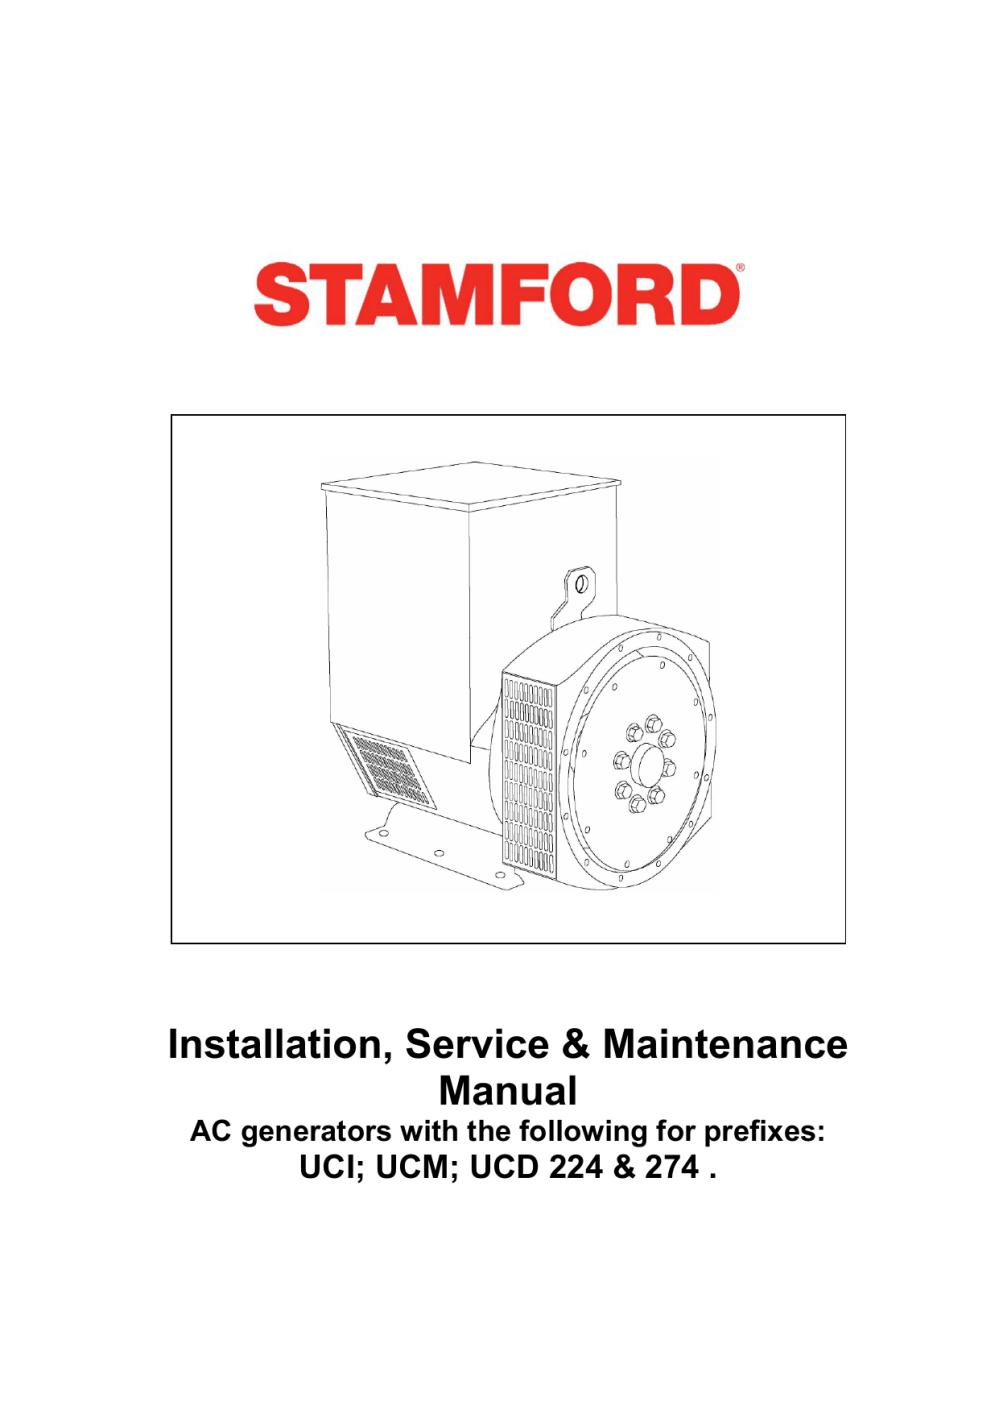 medium resolution of manual stamford uc22 powertech engines inc